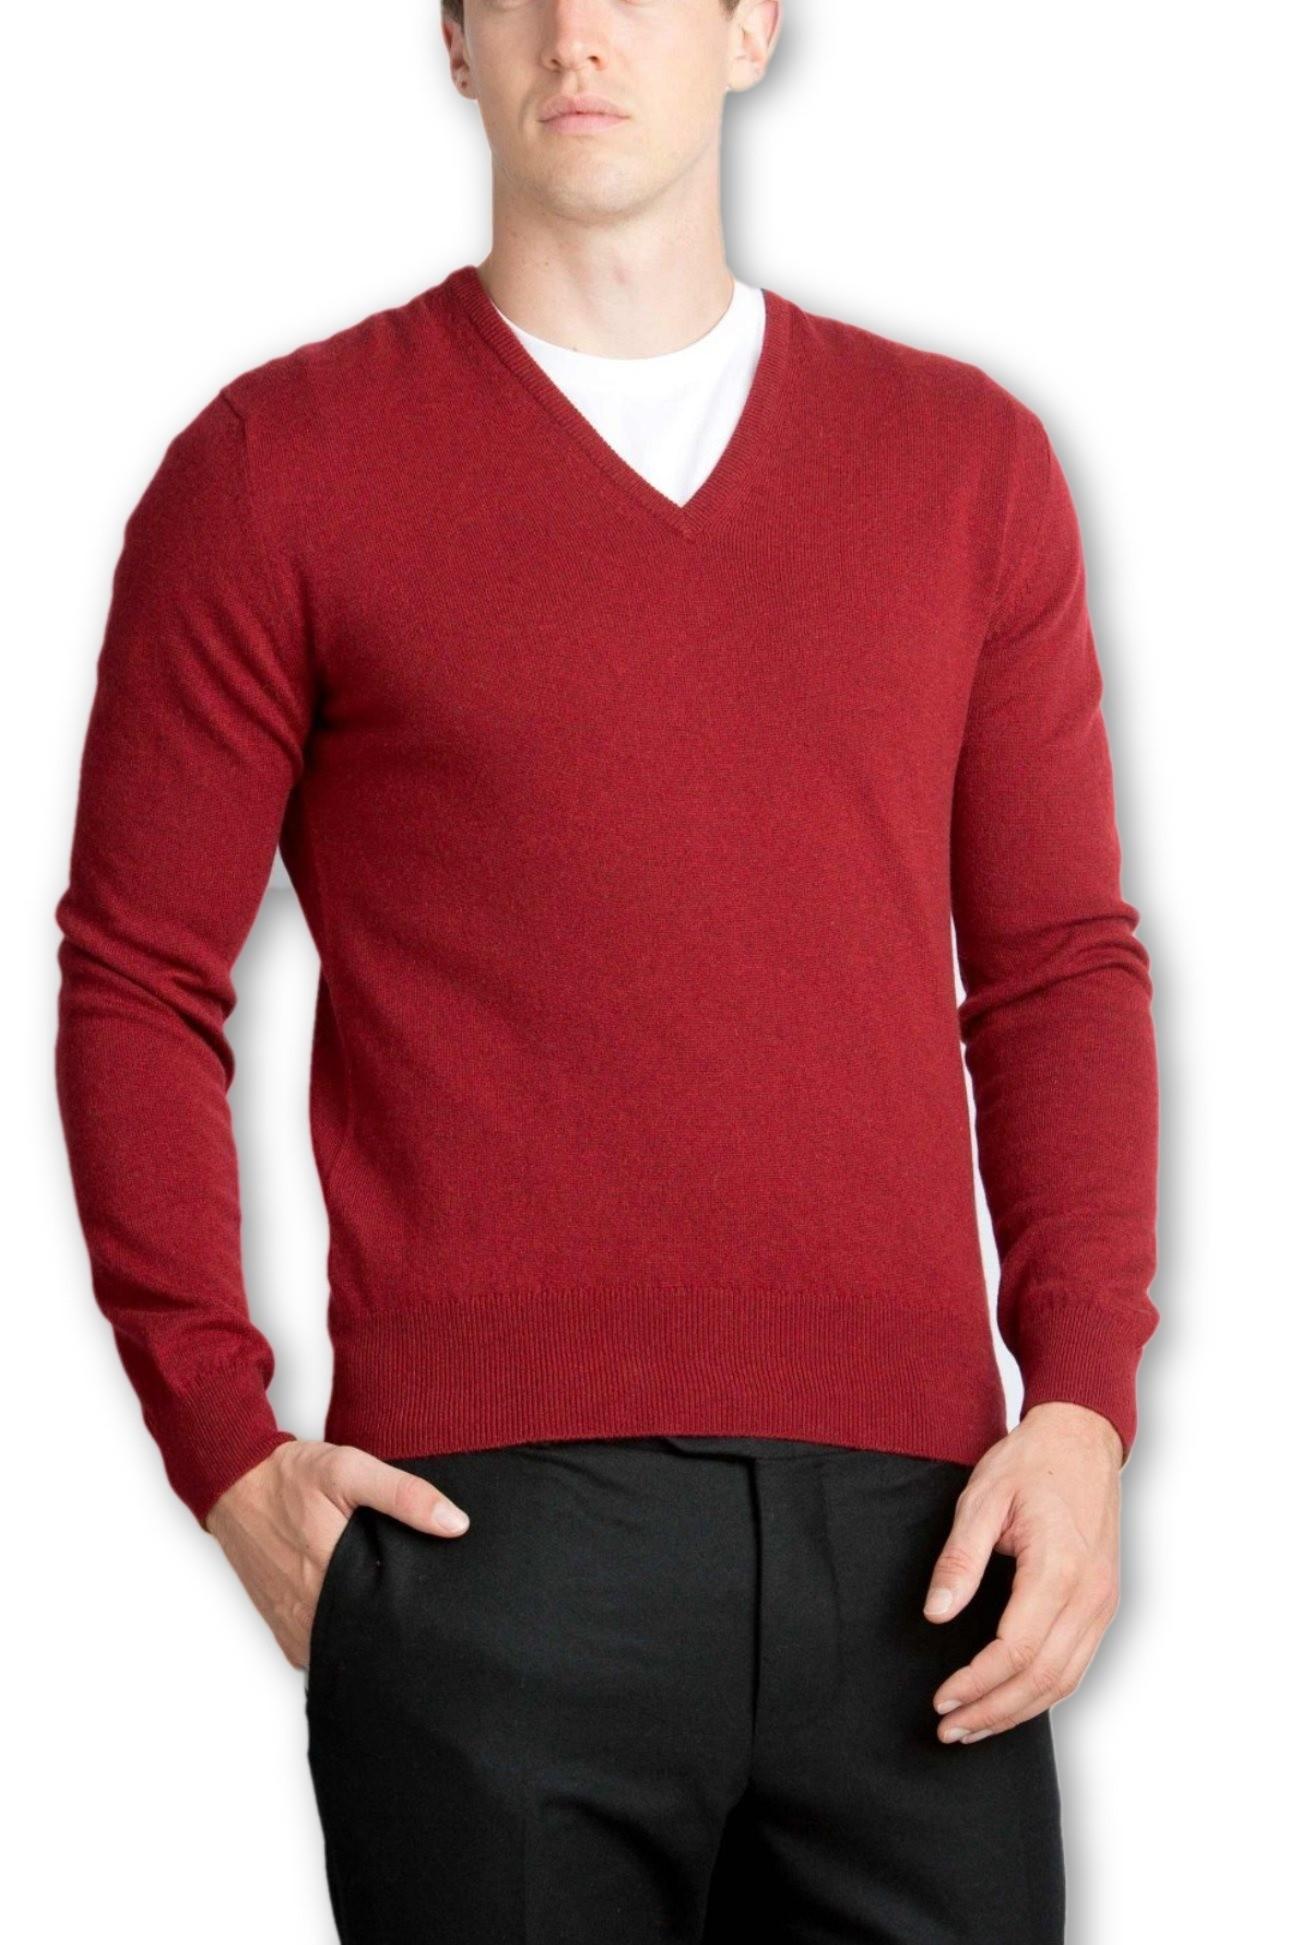 Claret Men's V-Neck Sweaters - 100% Cashmere Made in Scotland